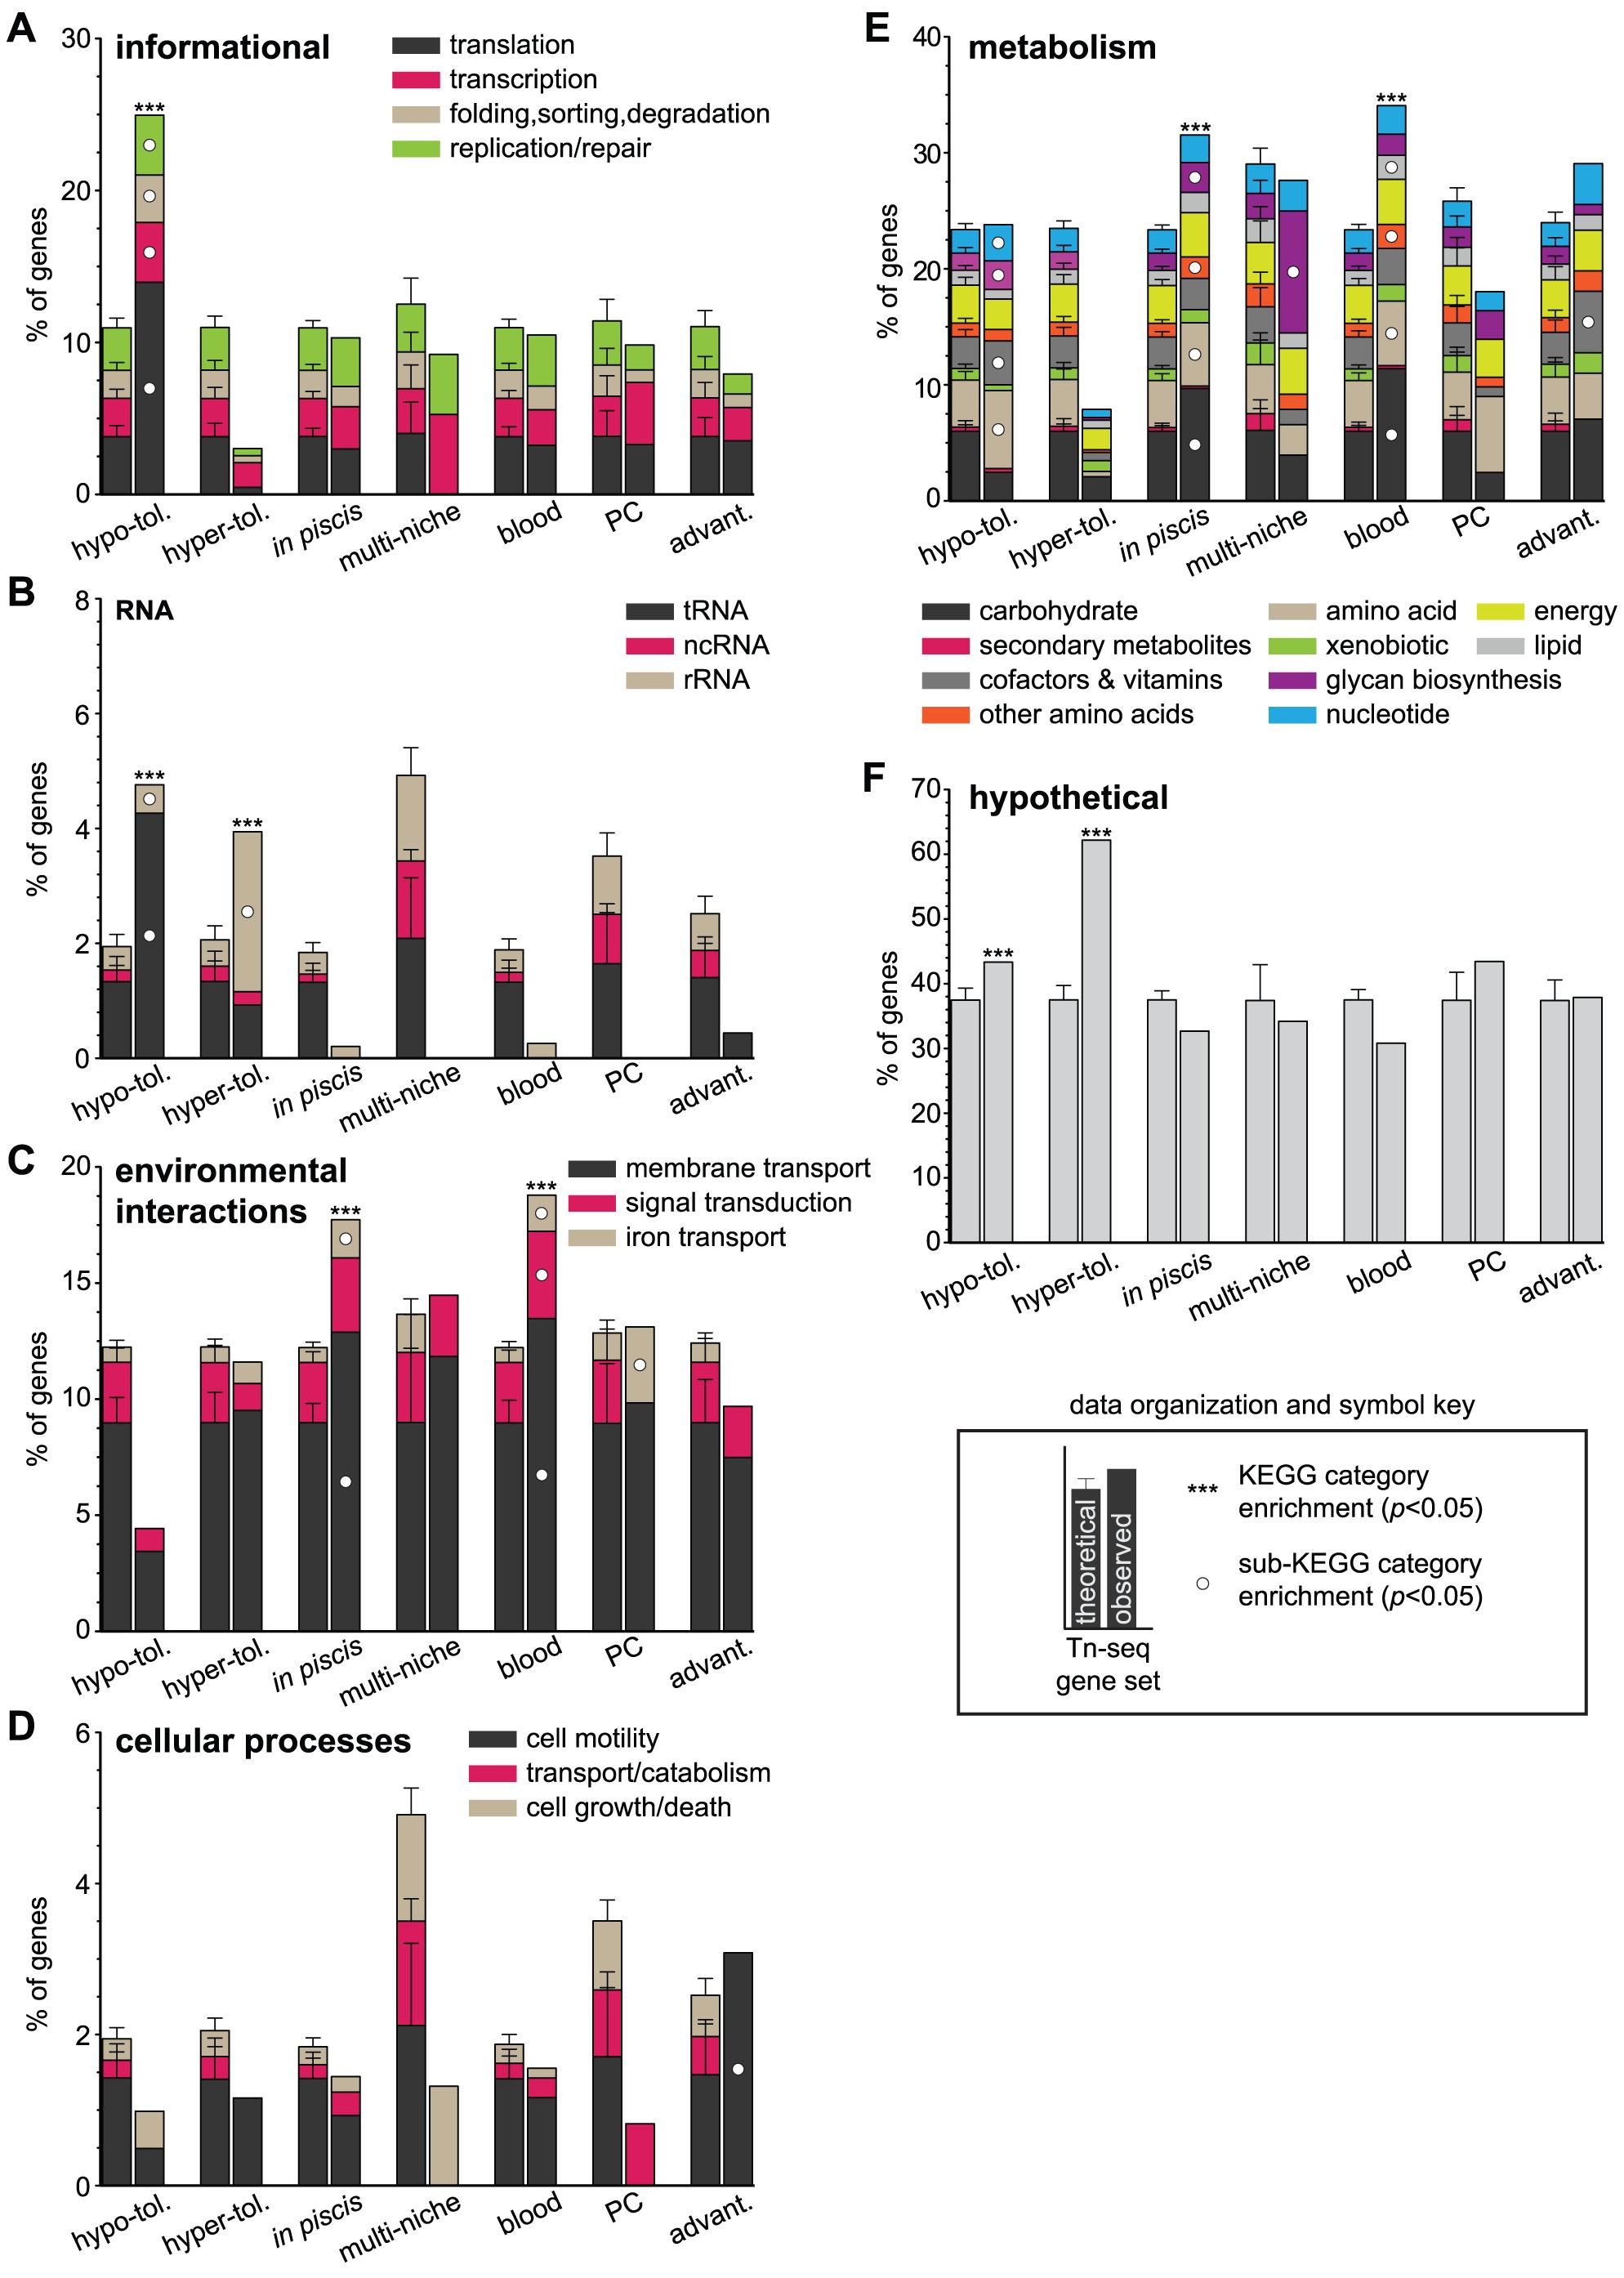 Functional KEGG categories enriched within gene sets.